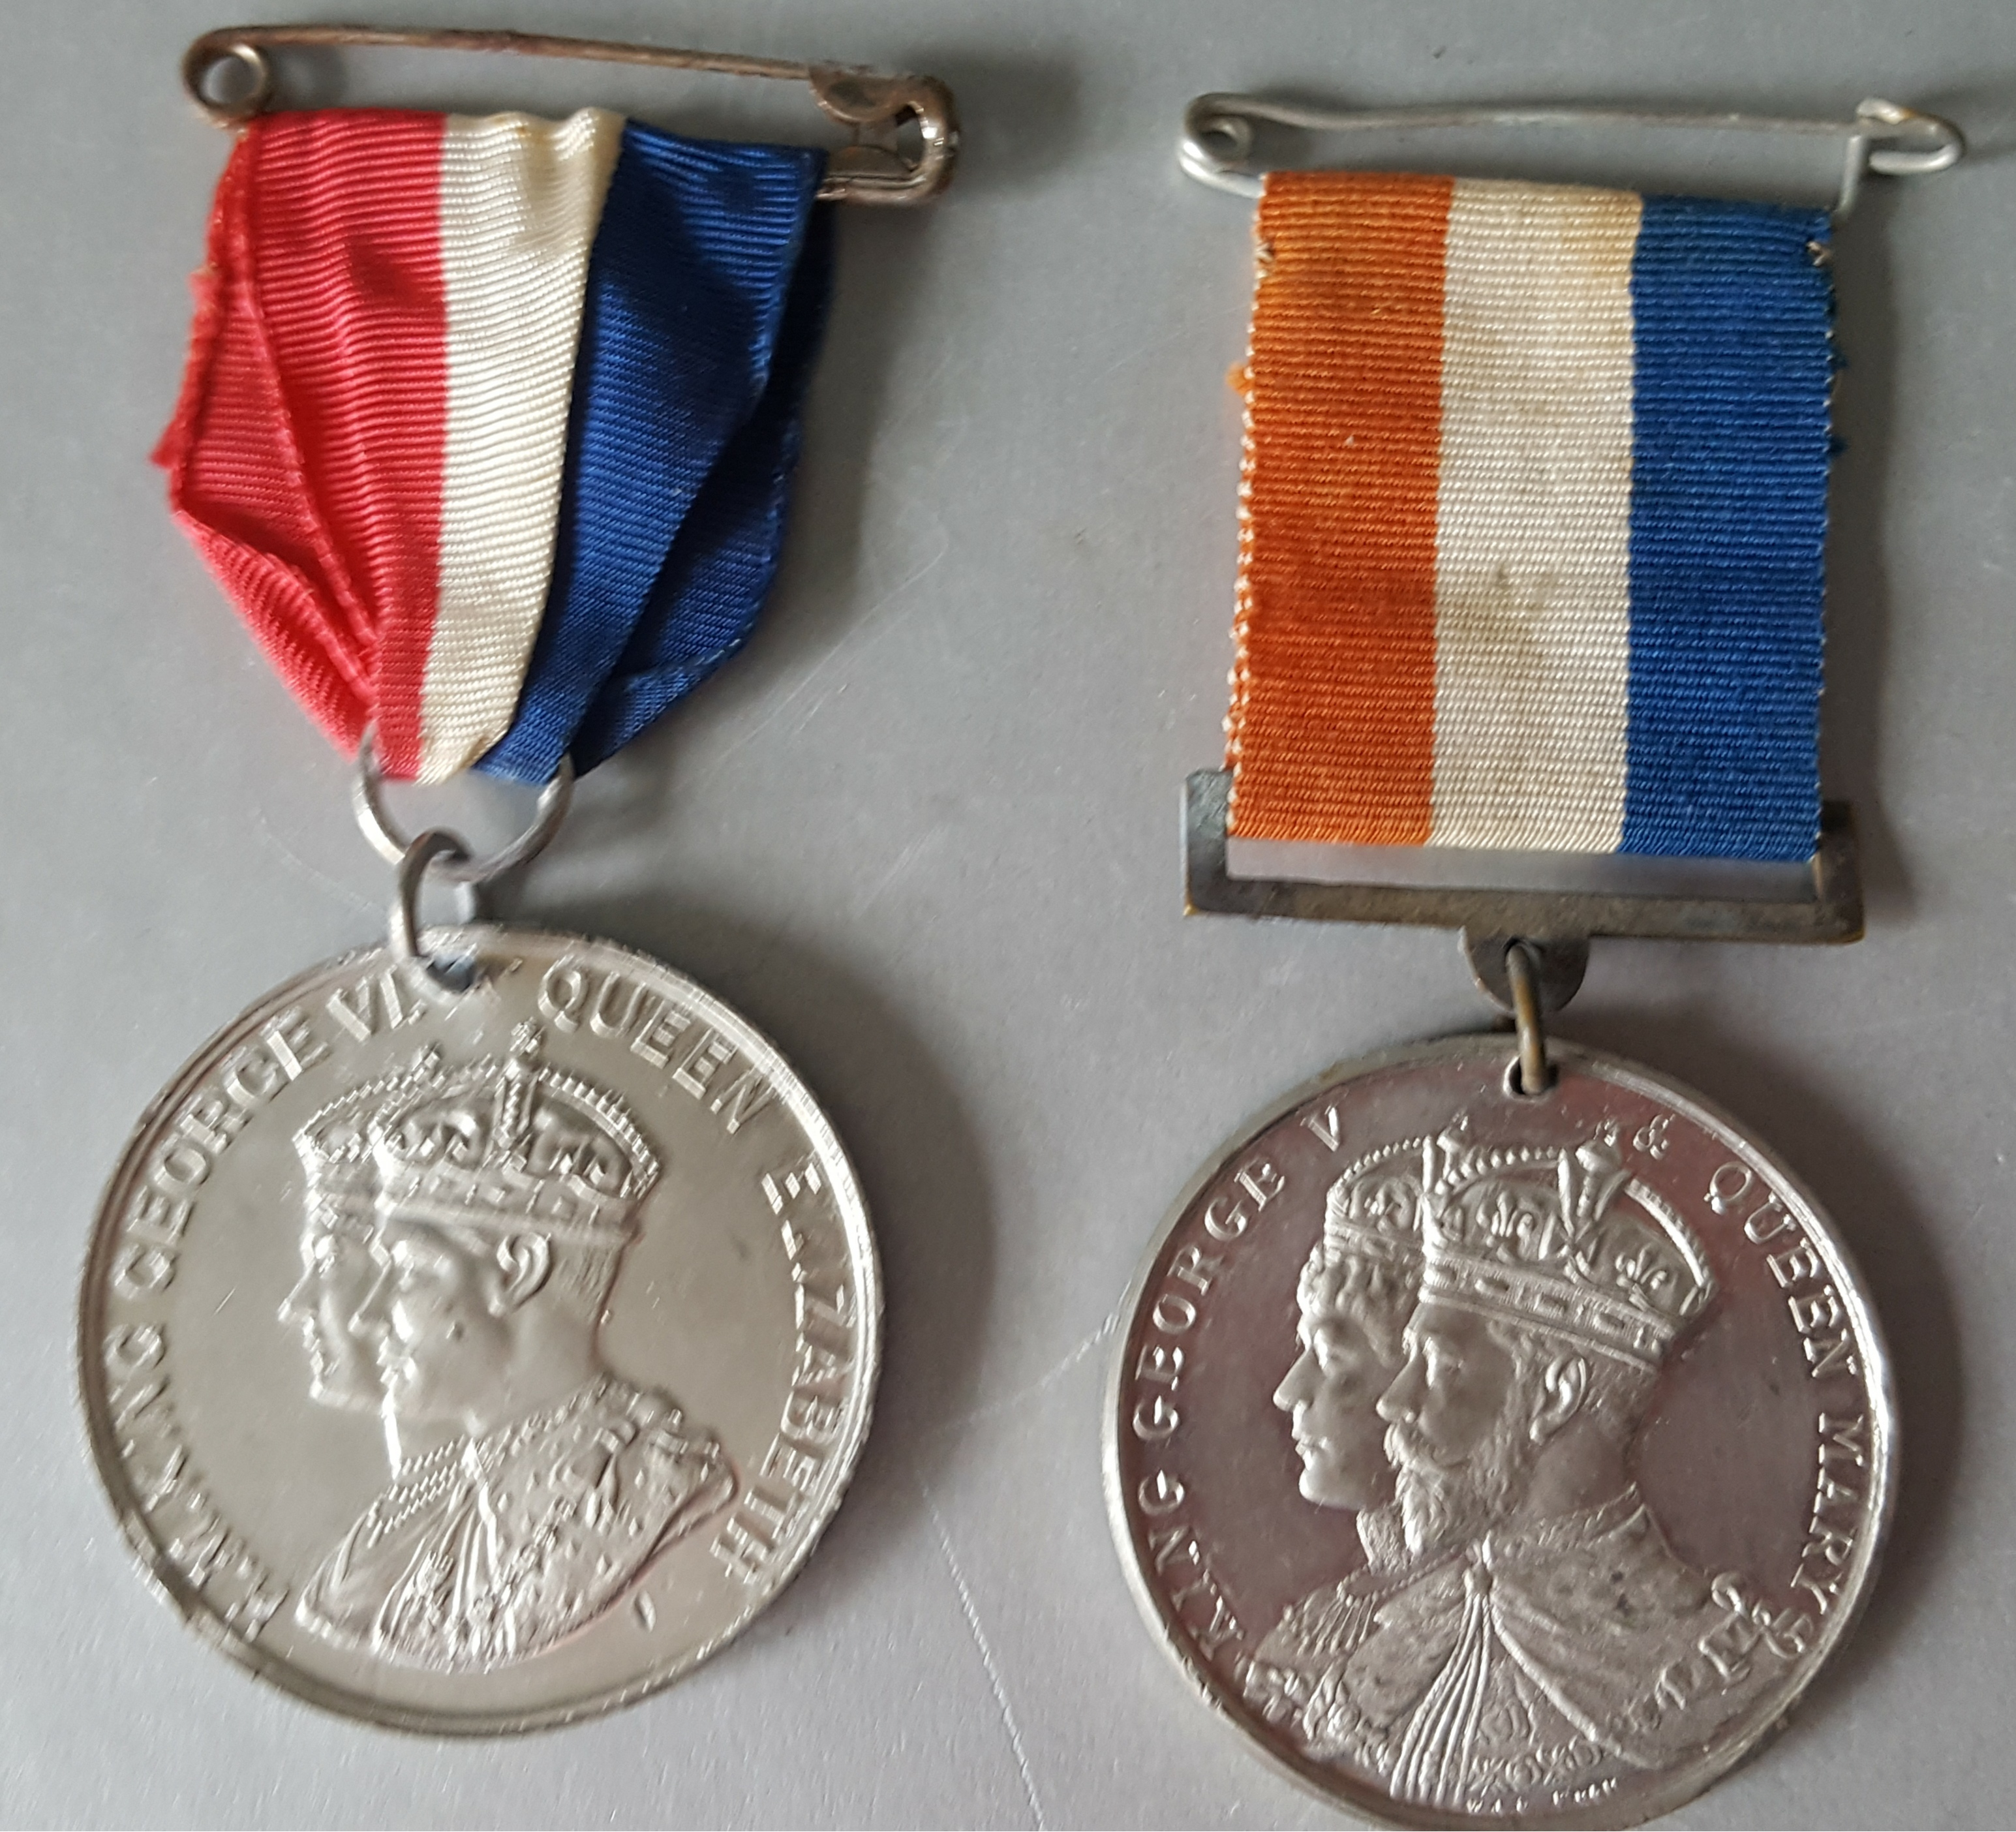 Lot 17 - Vintage Medals Commemorative Coronation of King George V 1911 & King George VI 1937 NO RESERVE